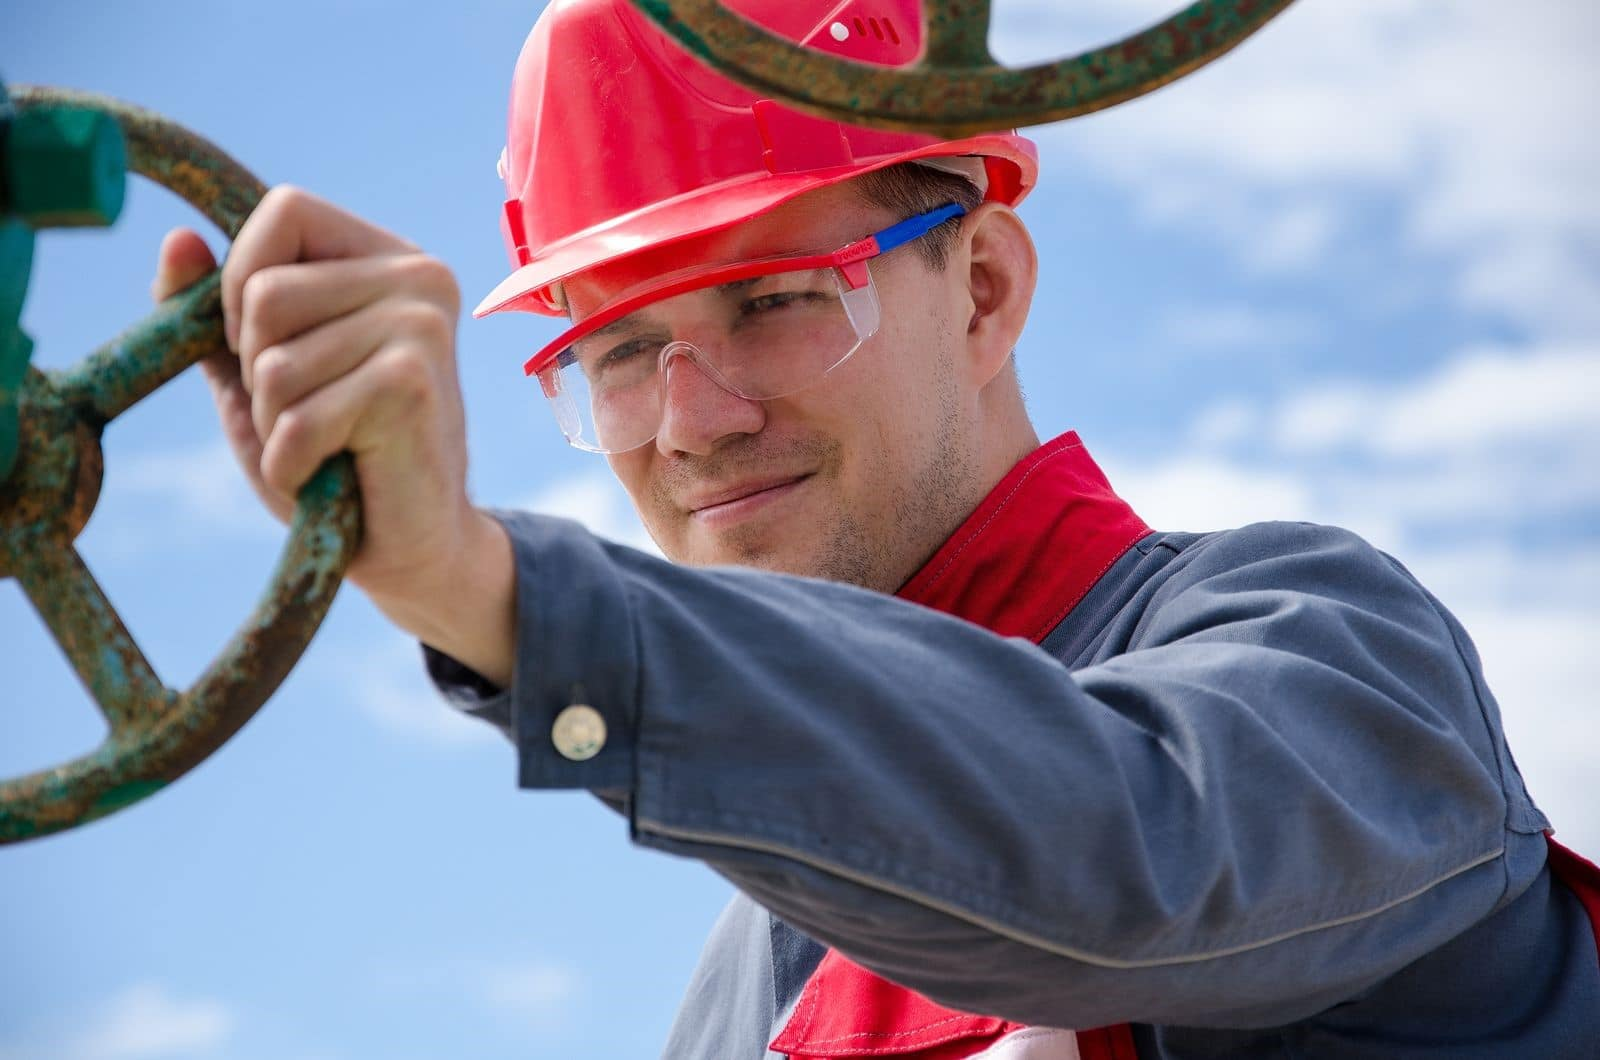 Impact of OSHA Regulations in Reducing Oilfield Injuries in Oklahoma